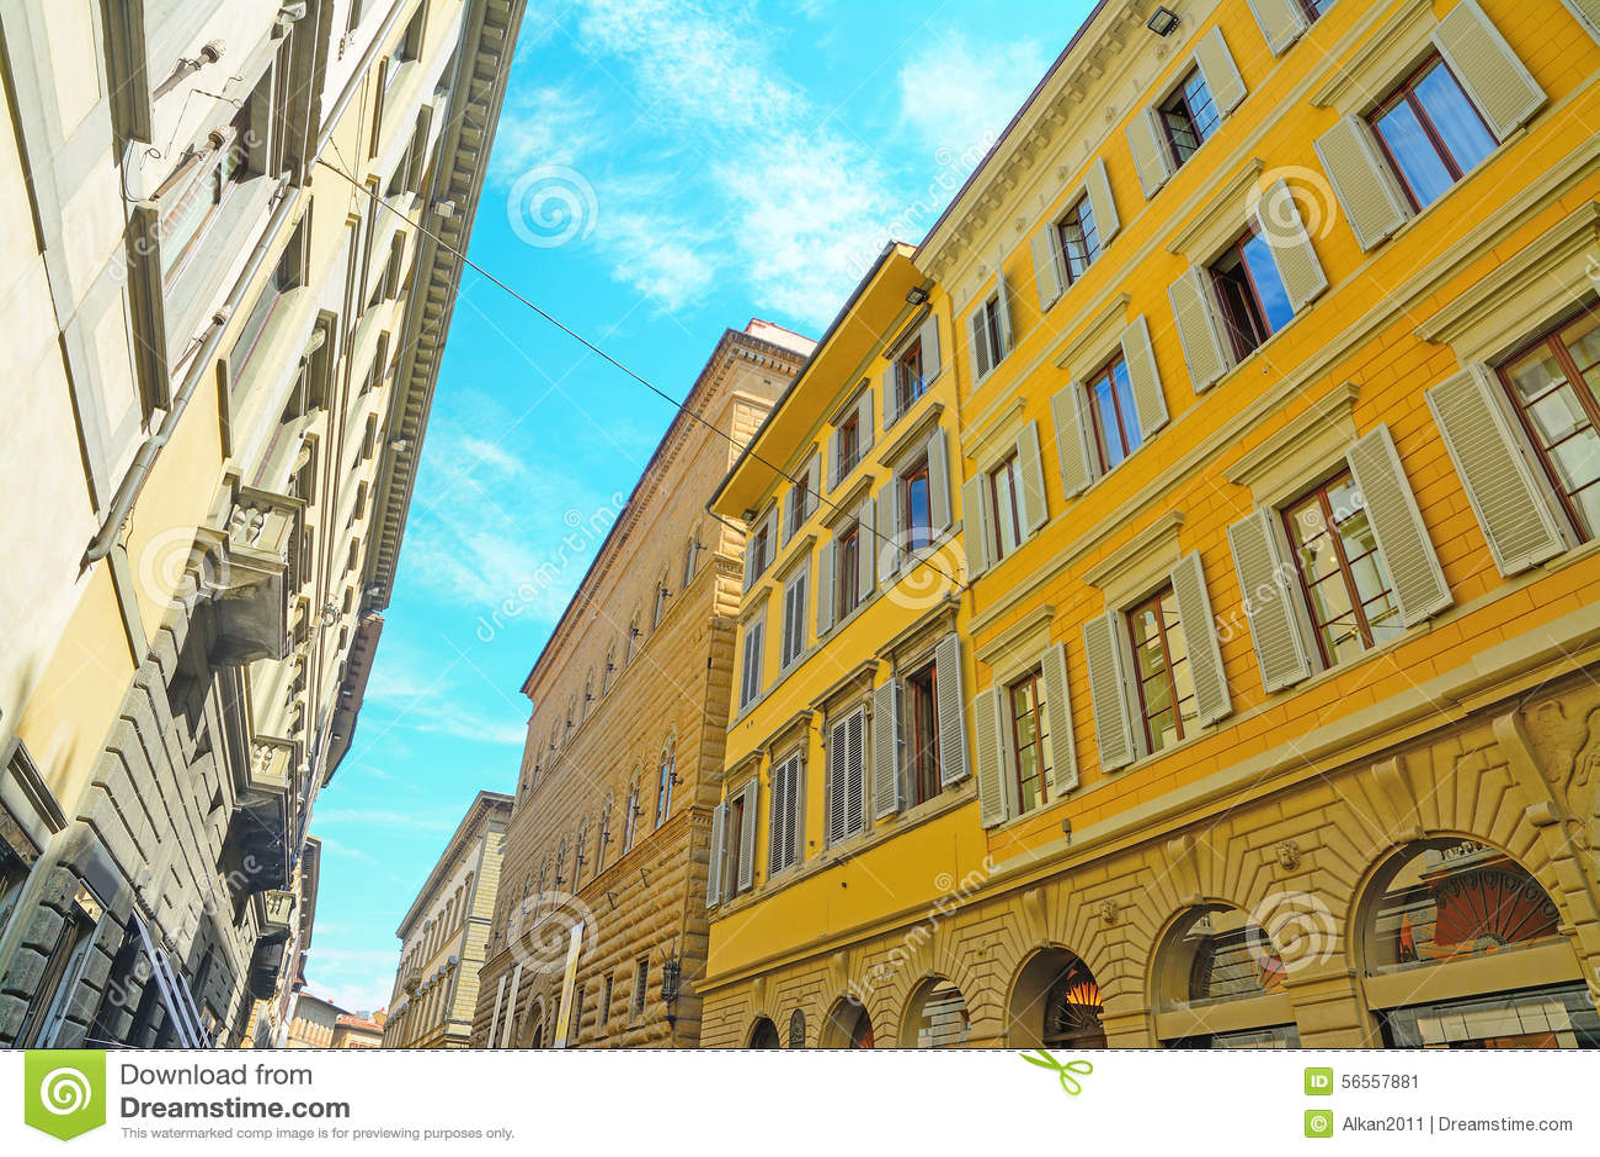 Download Ιστορικά κτήρια στη Φλωρεντία Στοκ Εικόνα - εικόνα από τοσκάνη, προορισμός: 56557881